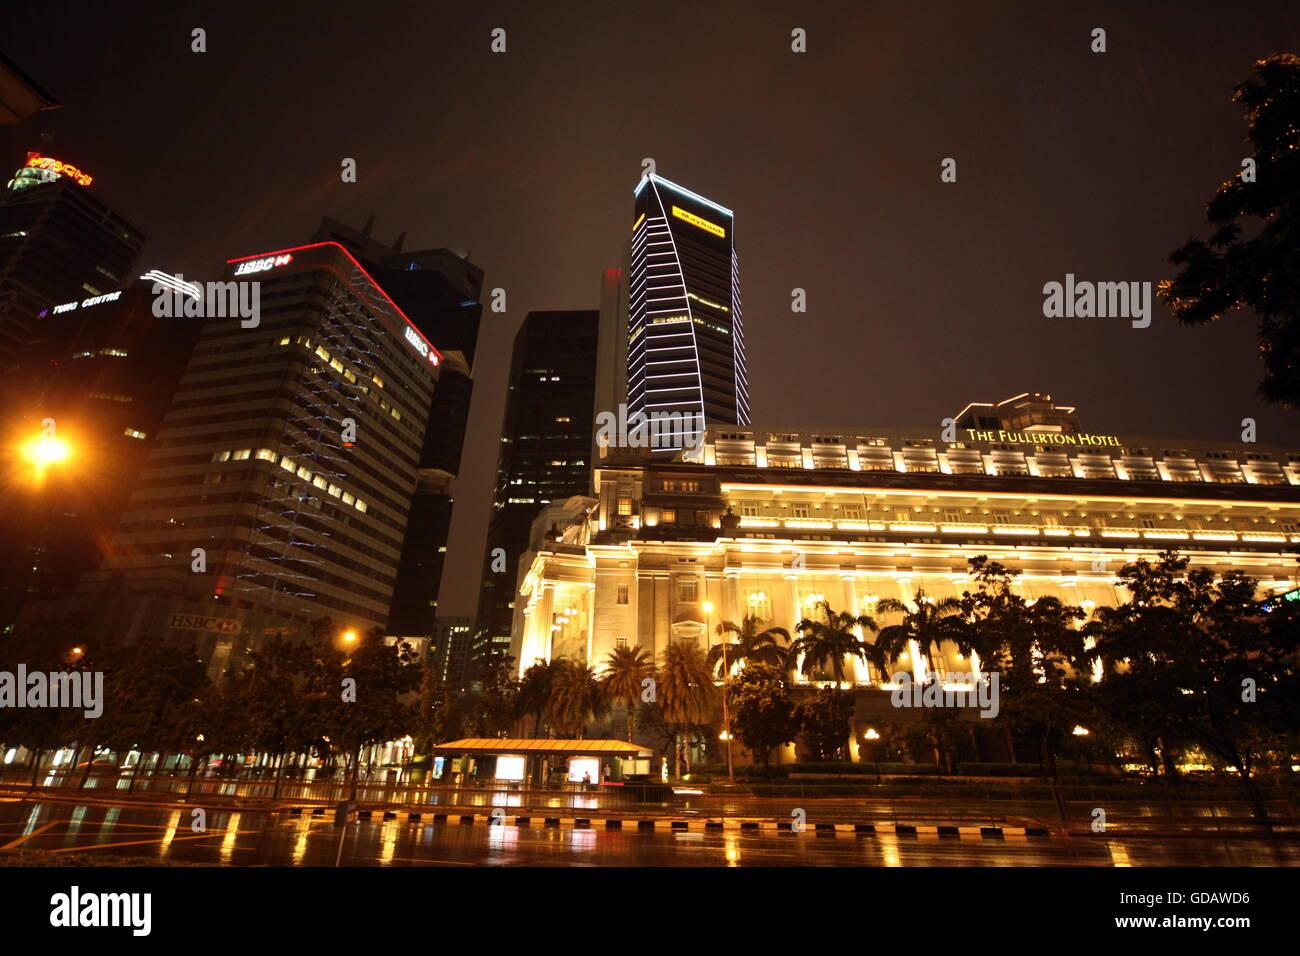 Asien, Suedost, Singapur, Insel, Staat, Stadt, City, Skyline, Zentrum, Fullerton Hotel,  Nacht Stock Photo